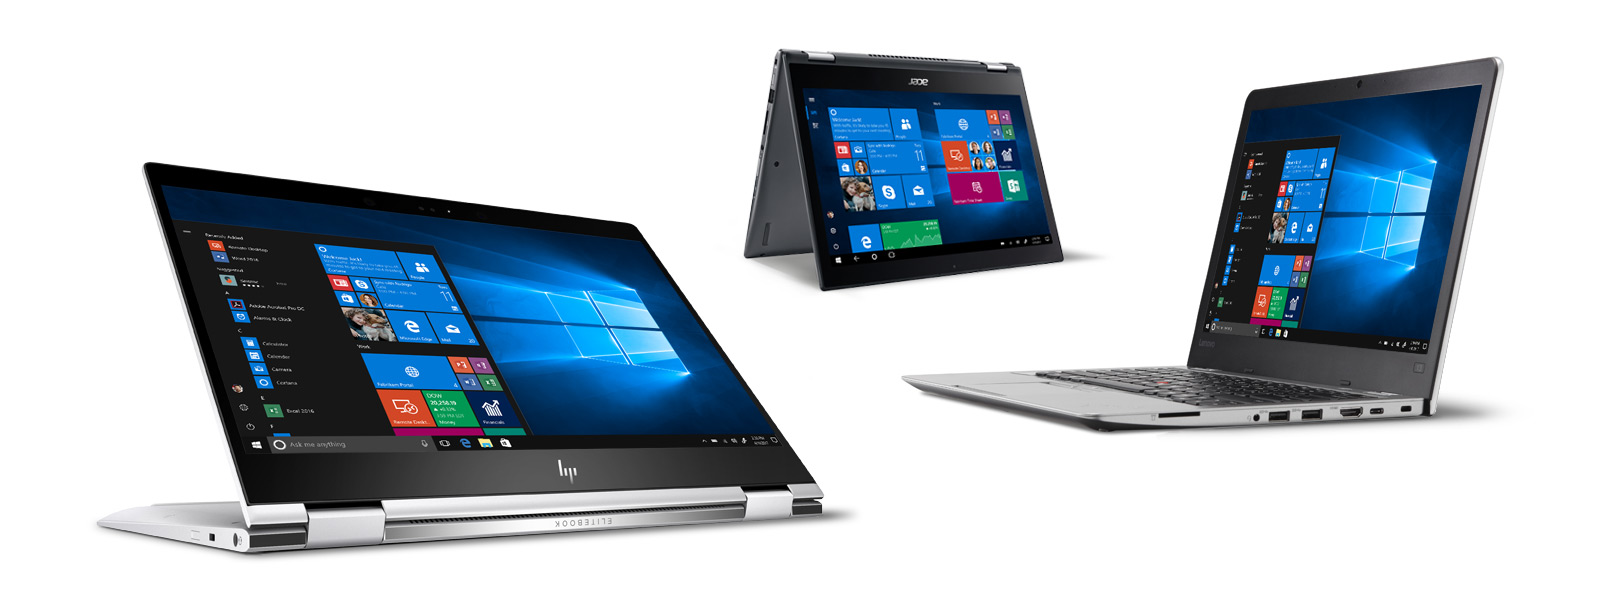 Windows 10 を表示している様々なノート PC